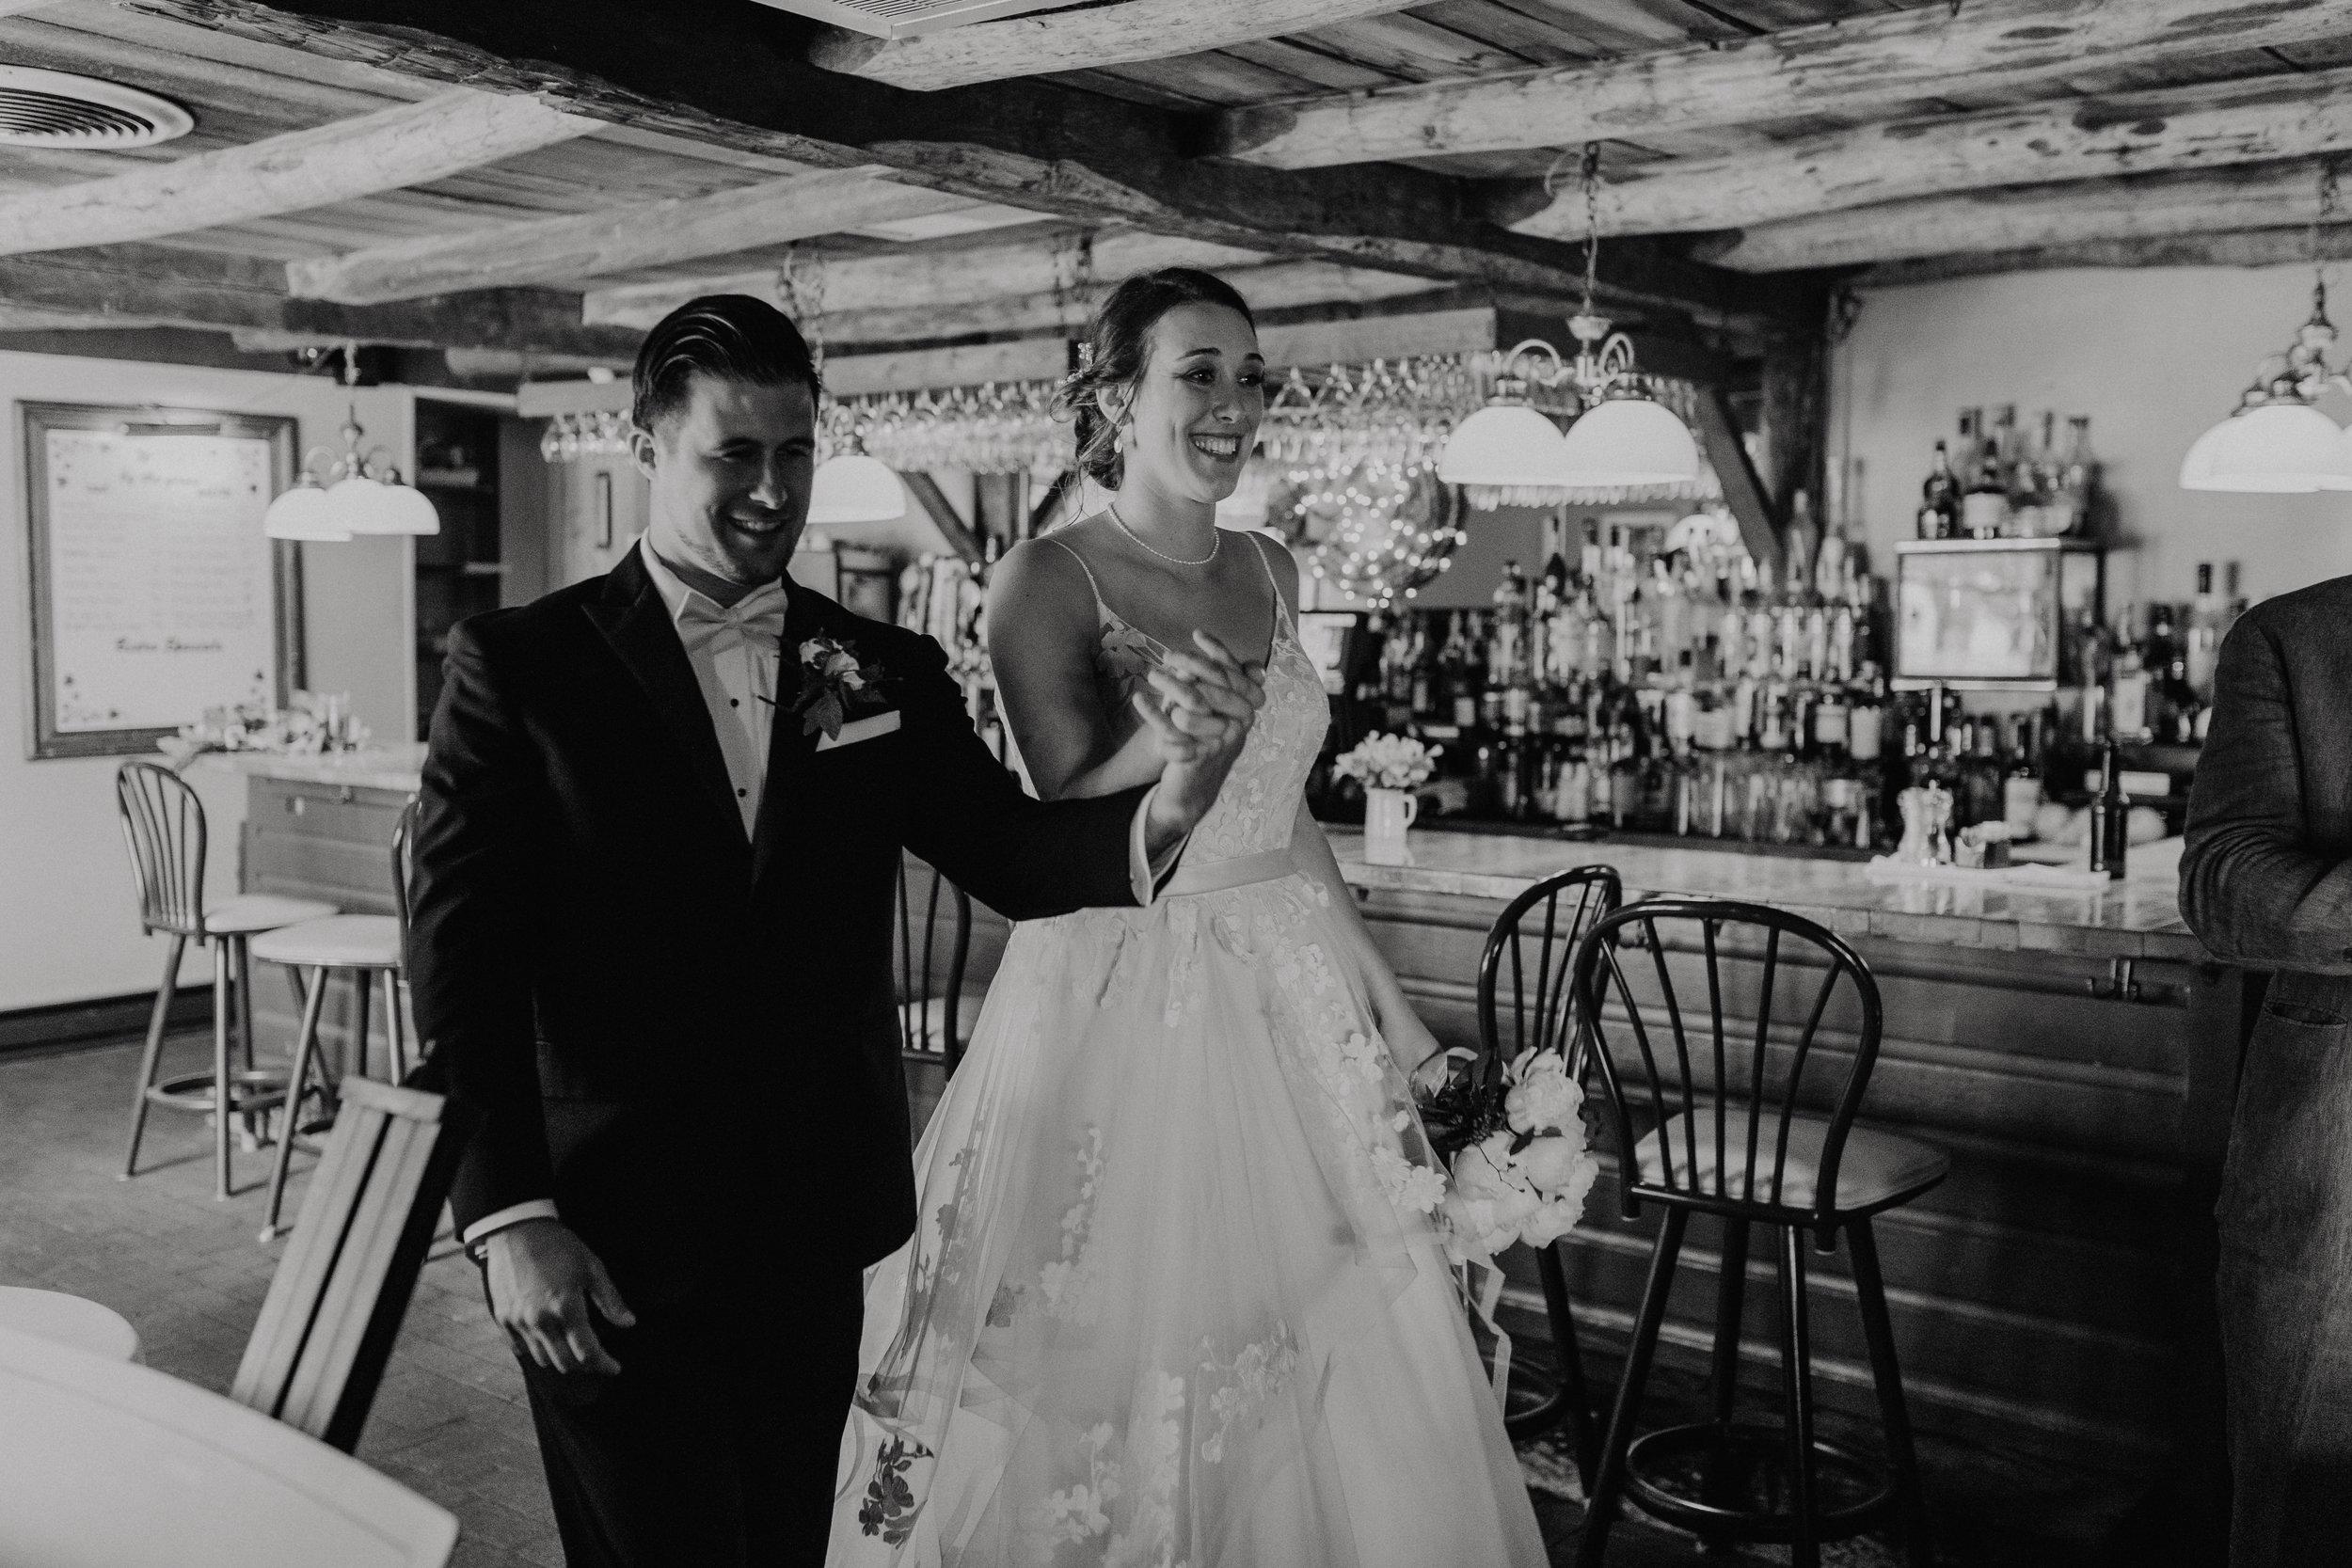 upstate_ny_wedding-42.jpg